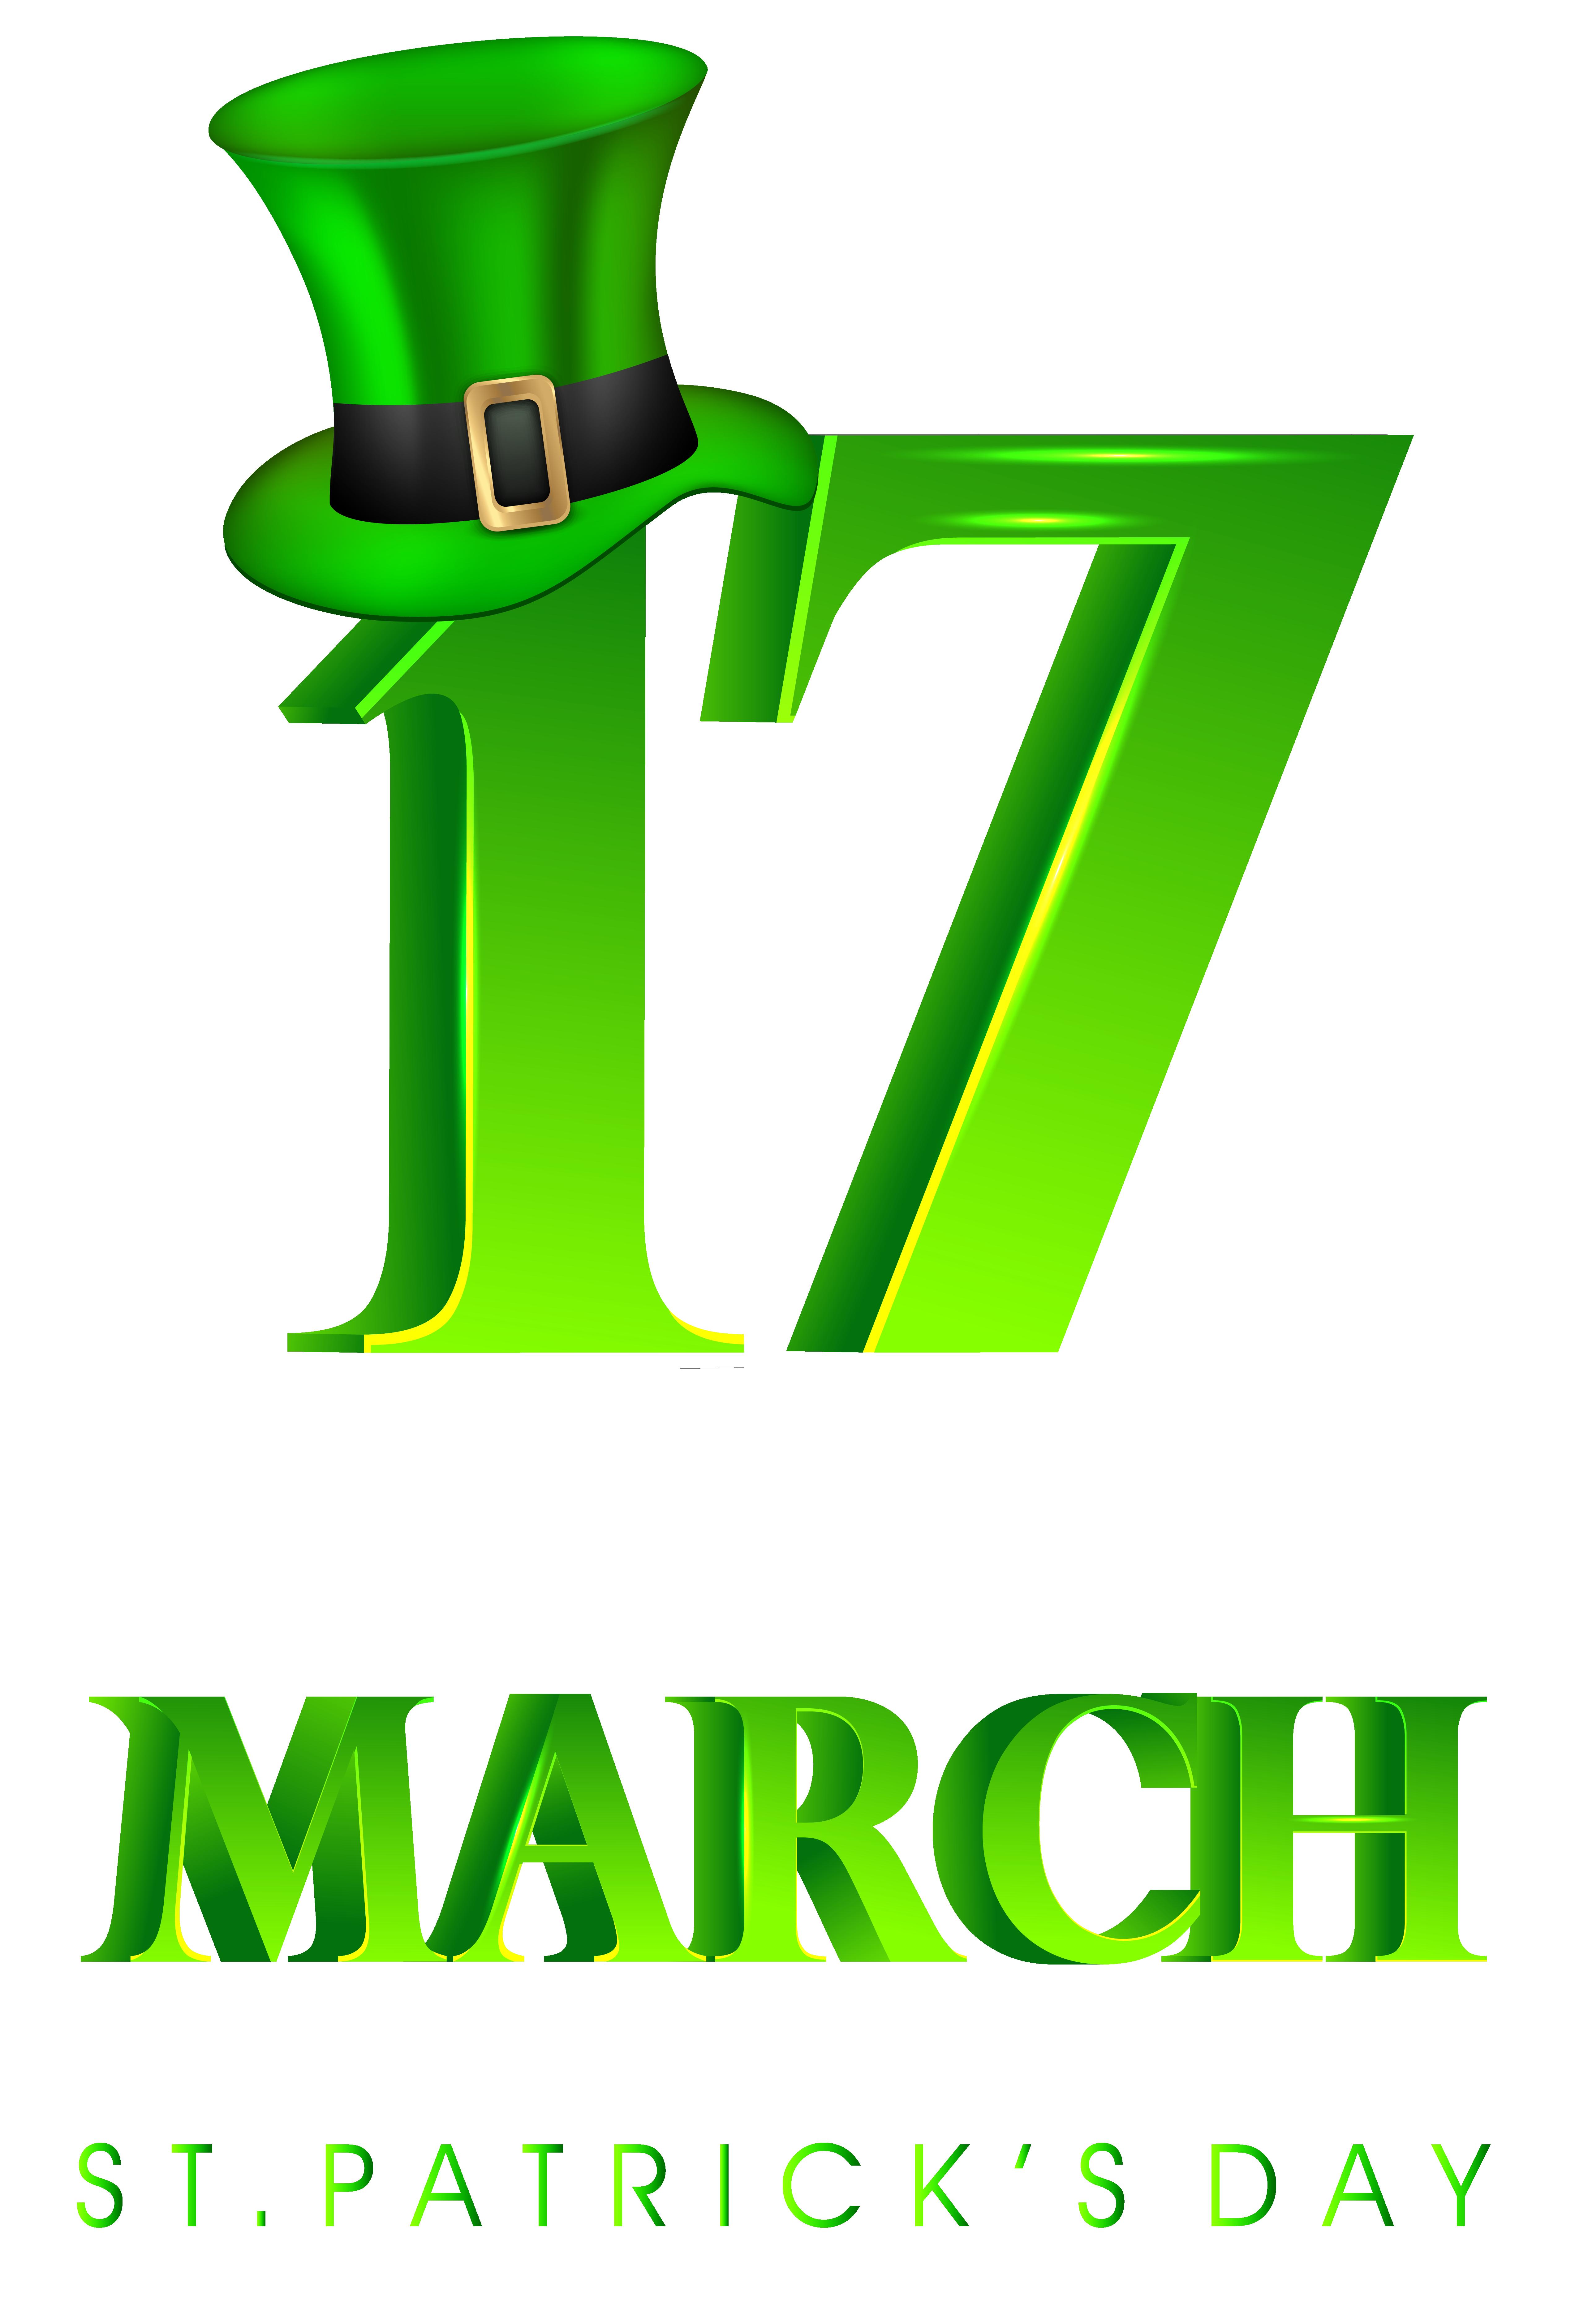 Saint Patrick Day Clipart